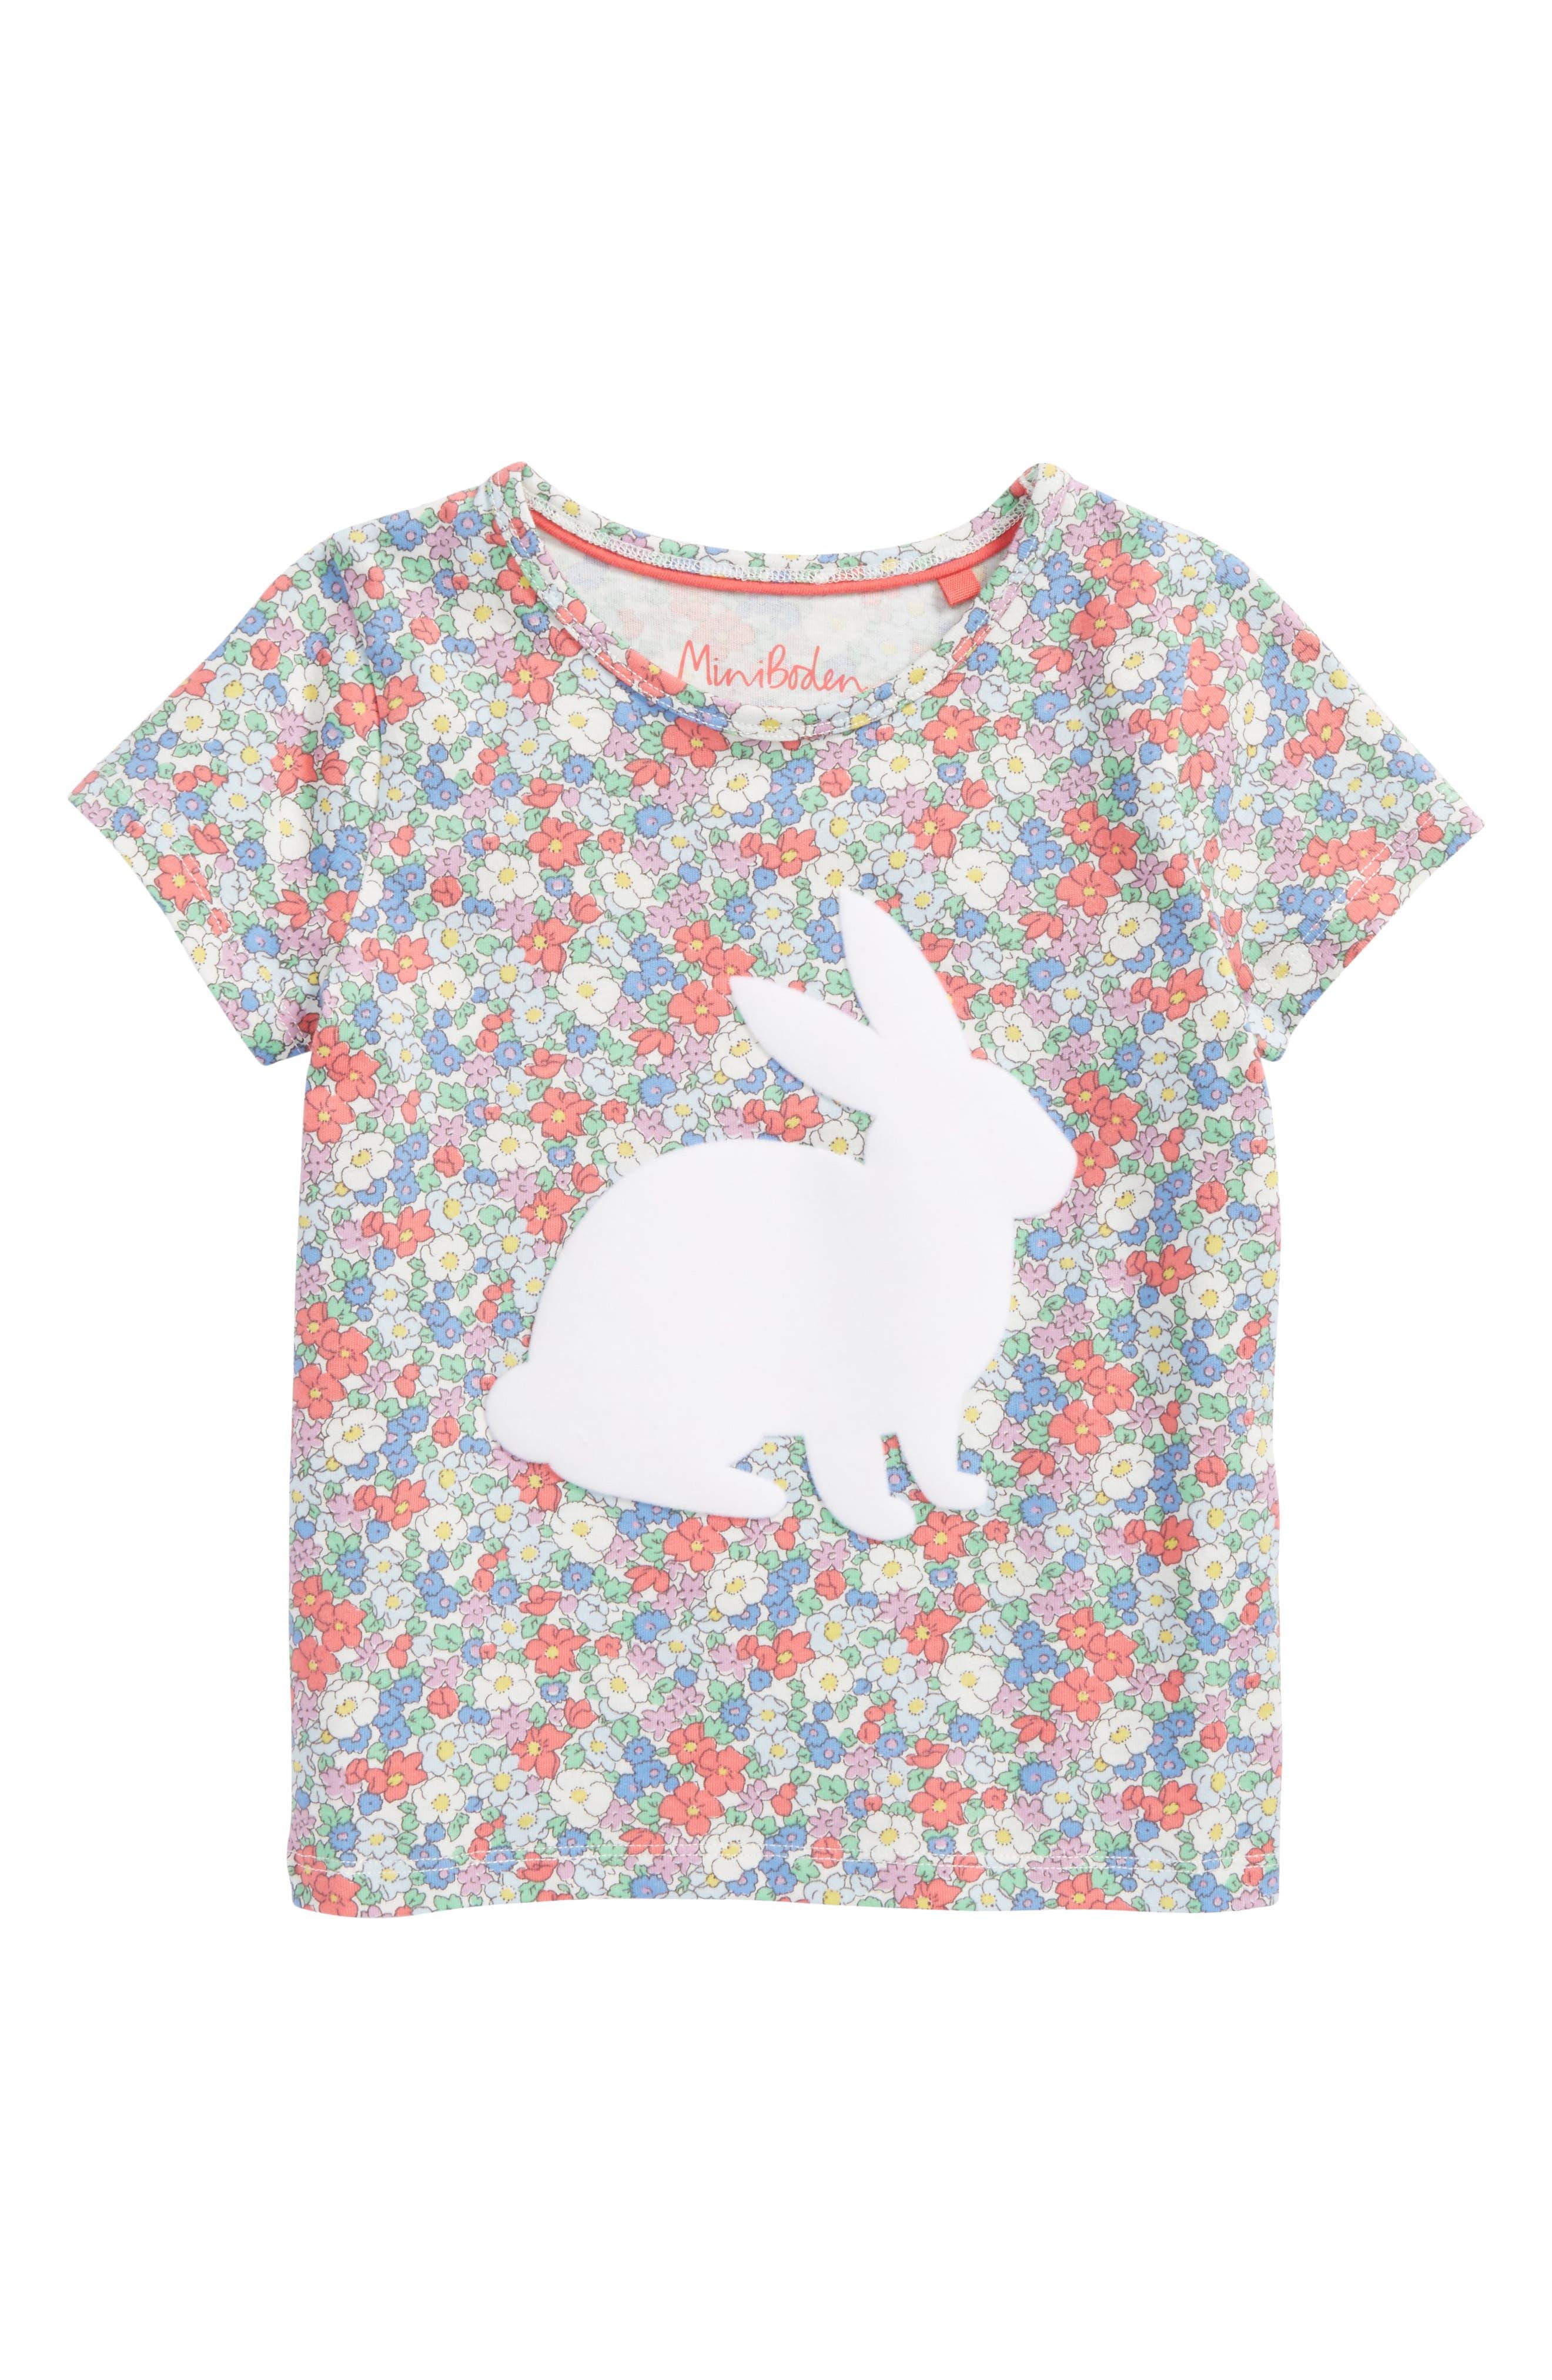 Floral Bunny Appliqué Tee,                             Main thumbnail 1, color,                             Strawberry Floral Bunny